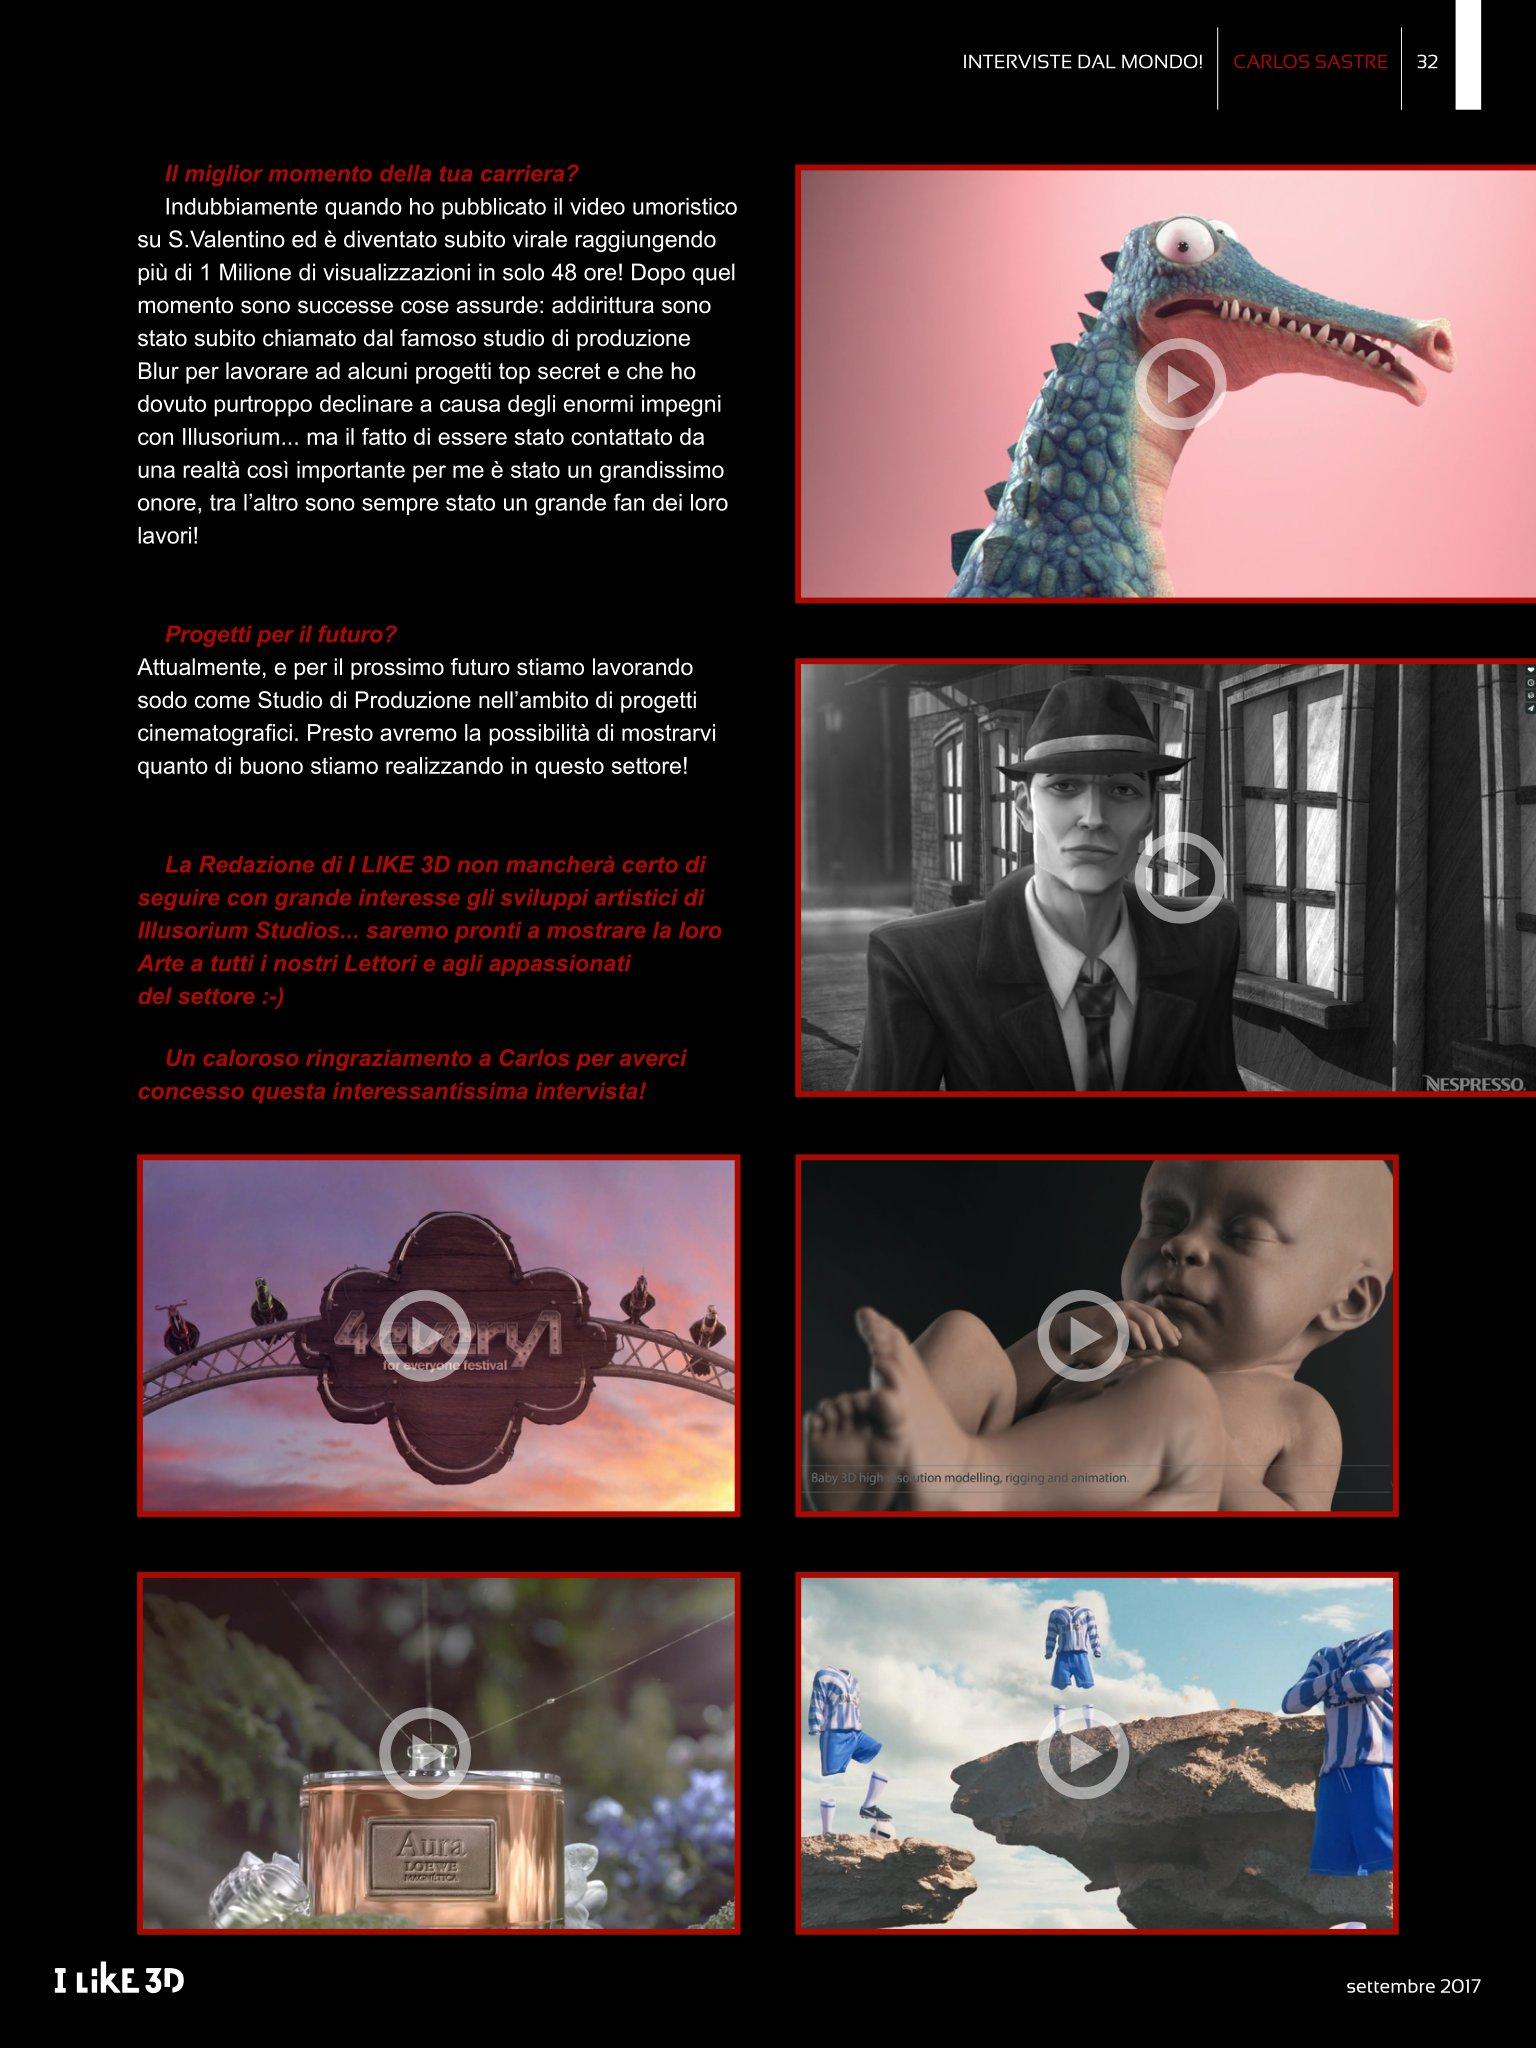 Interviste dal Mondo - I Like 3D #16